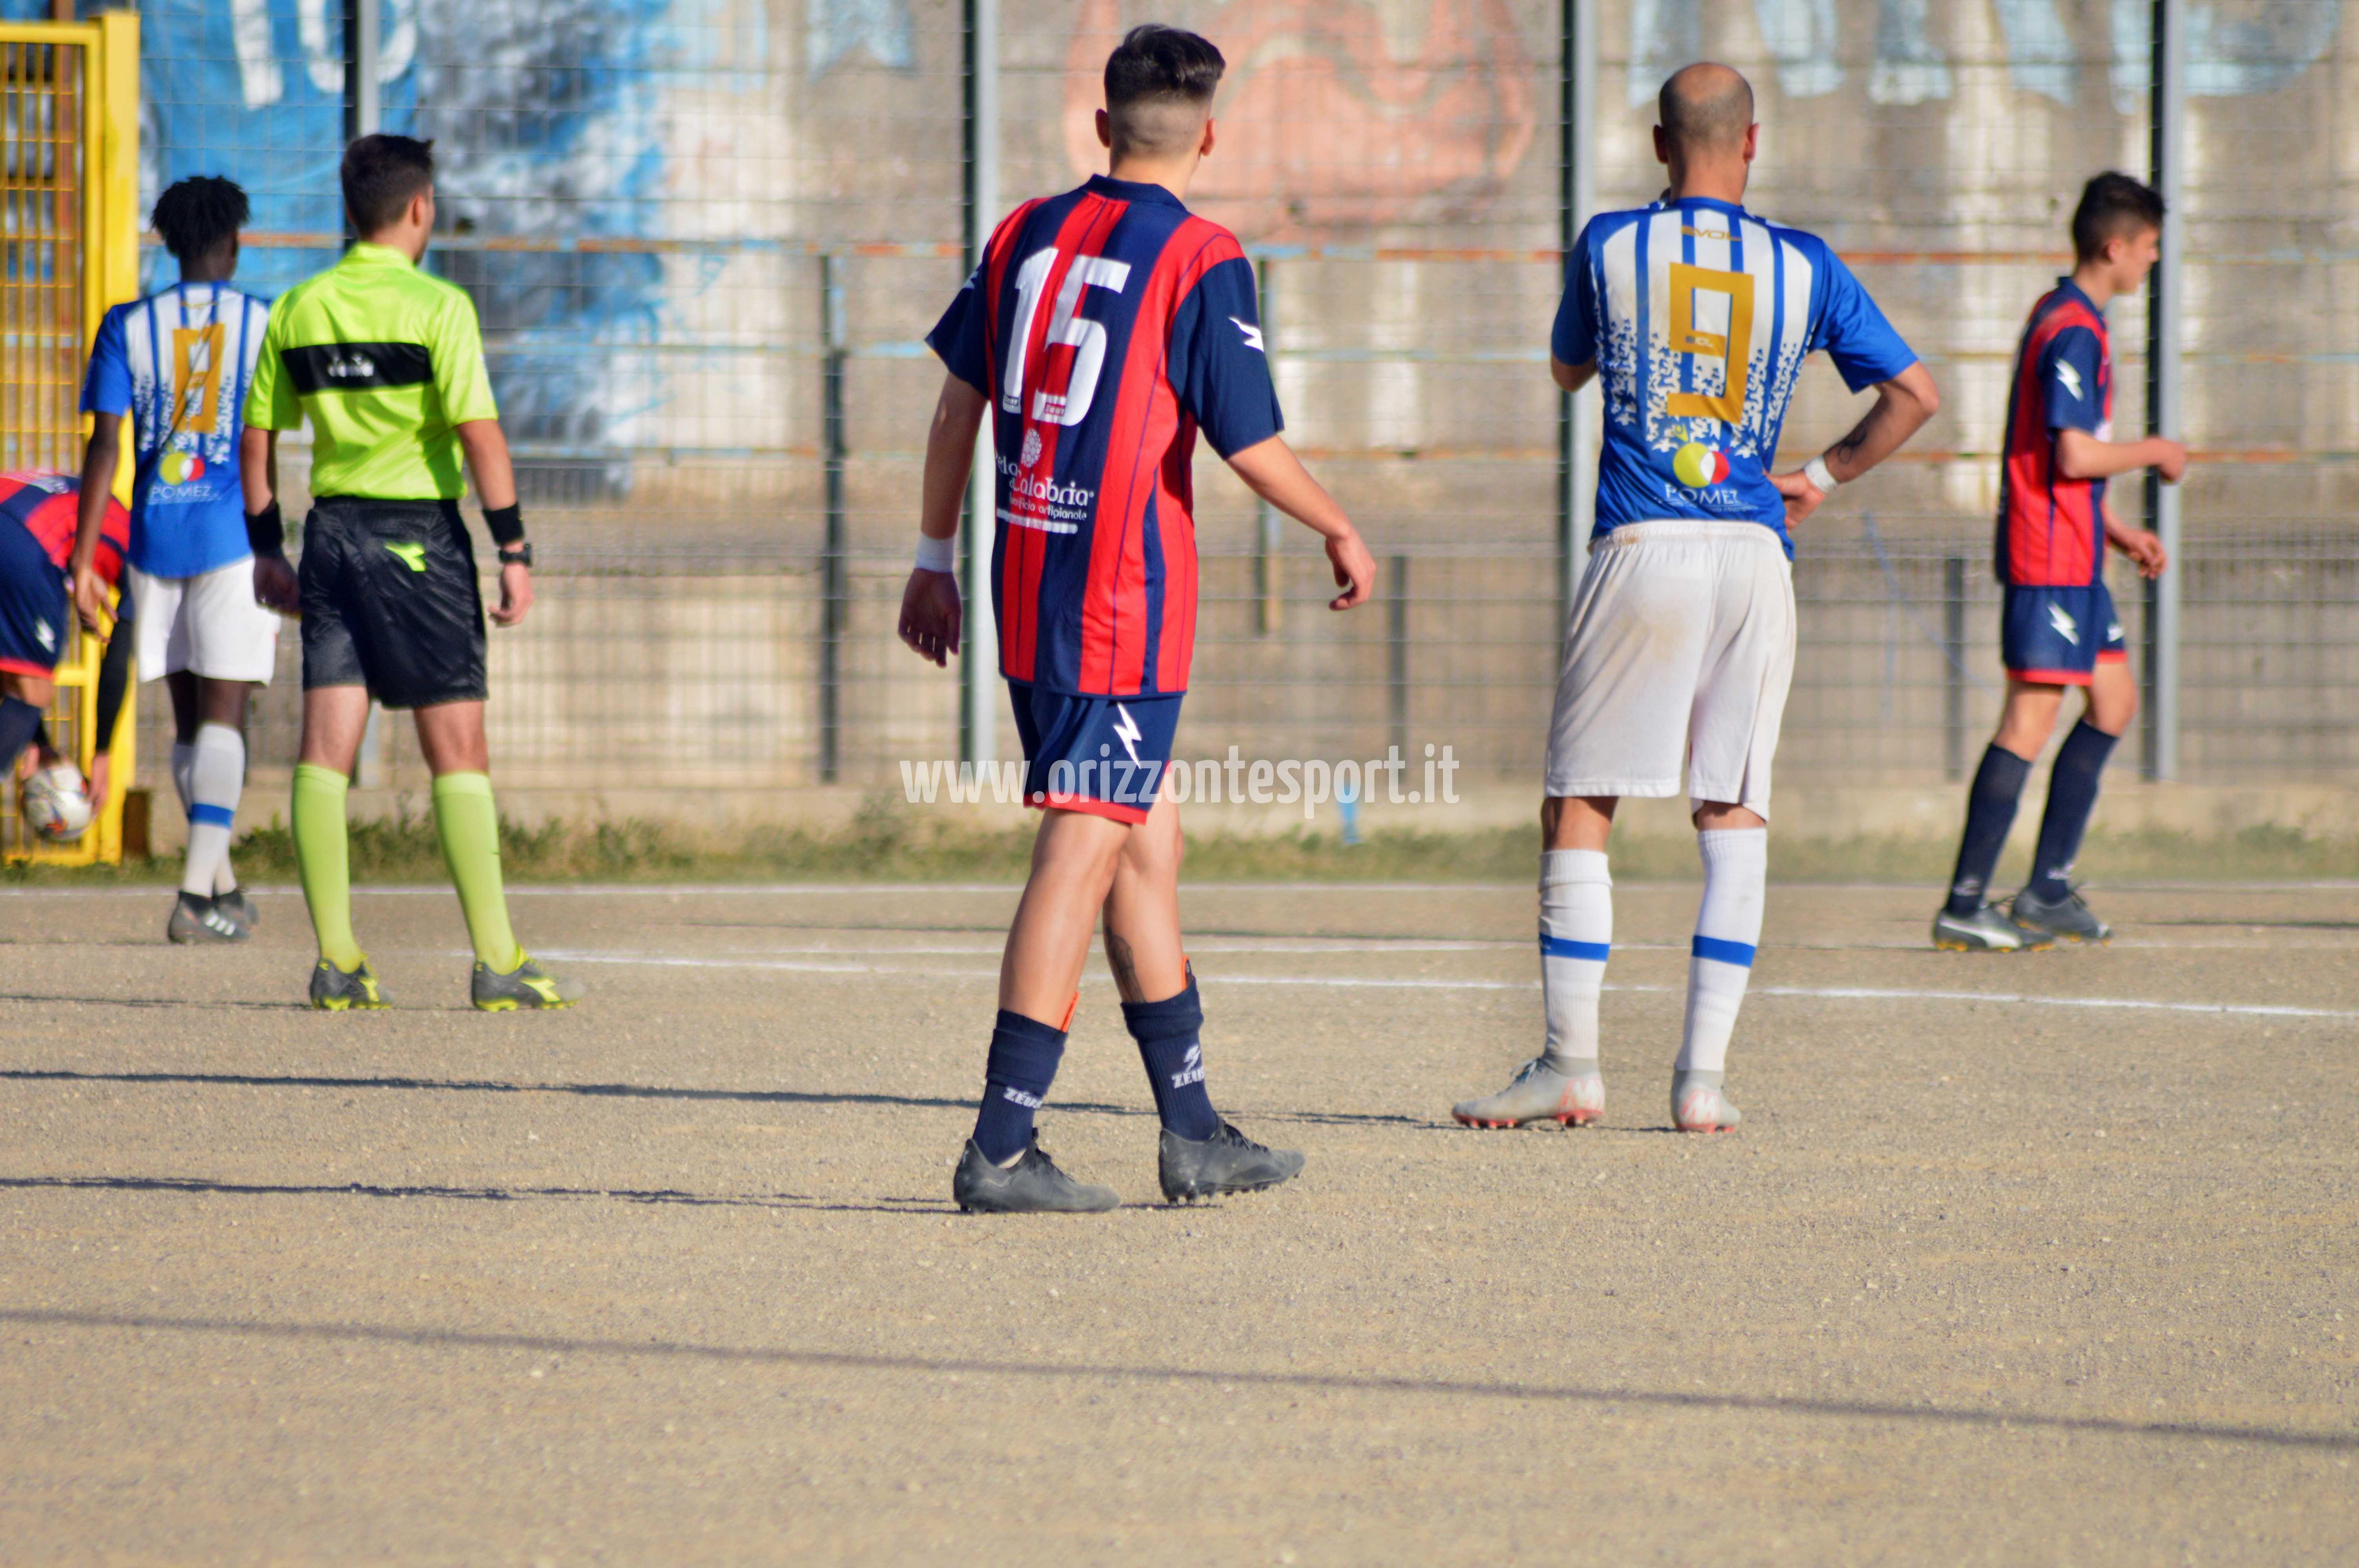 cassano_rossanese (141)